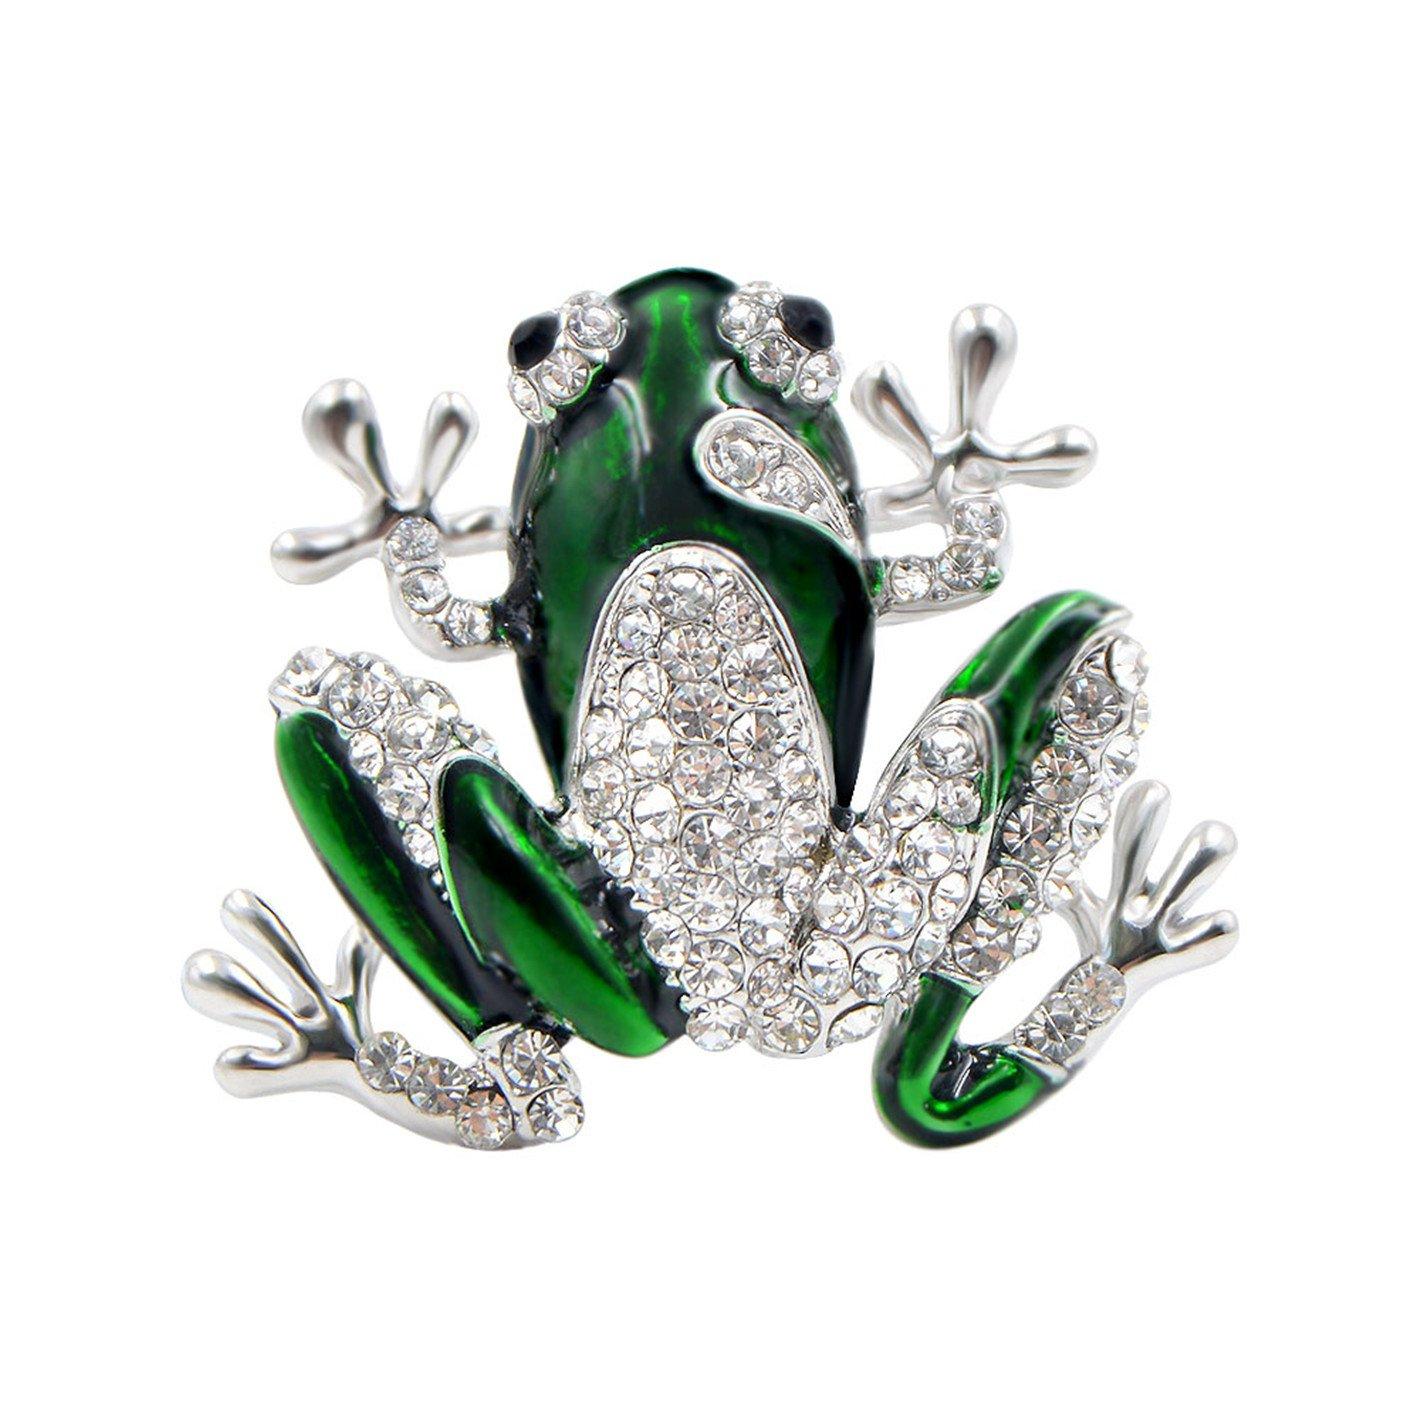 Rhinestone Green Frog Brooch Unisex Cute Animal Brooch Pin Women Men Dress Coat Accessories